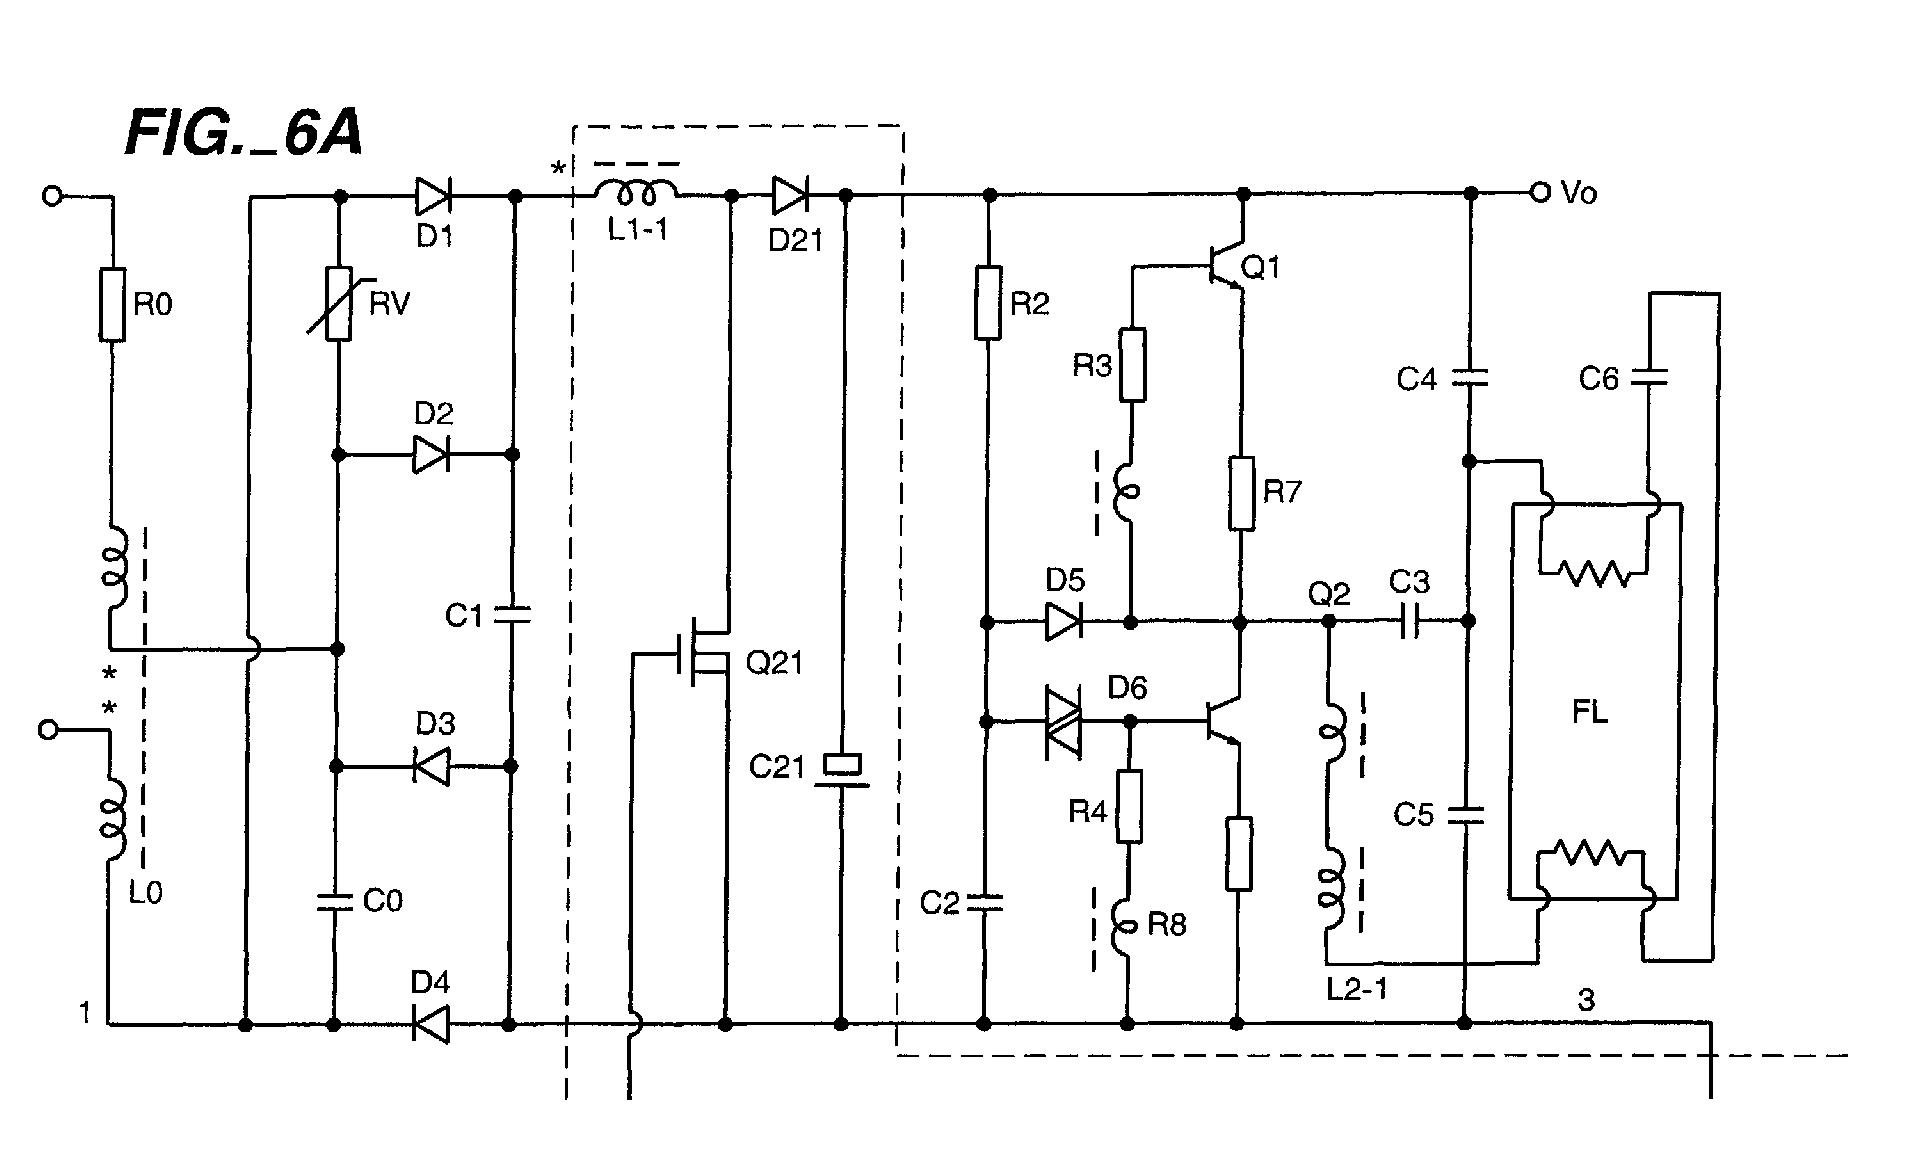 4 Pin Cfl Wiring Diagram Auto Electrical Socket Lamp